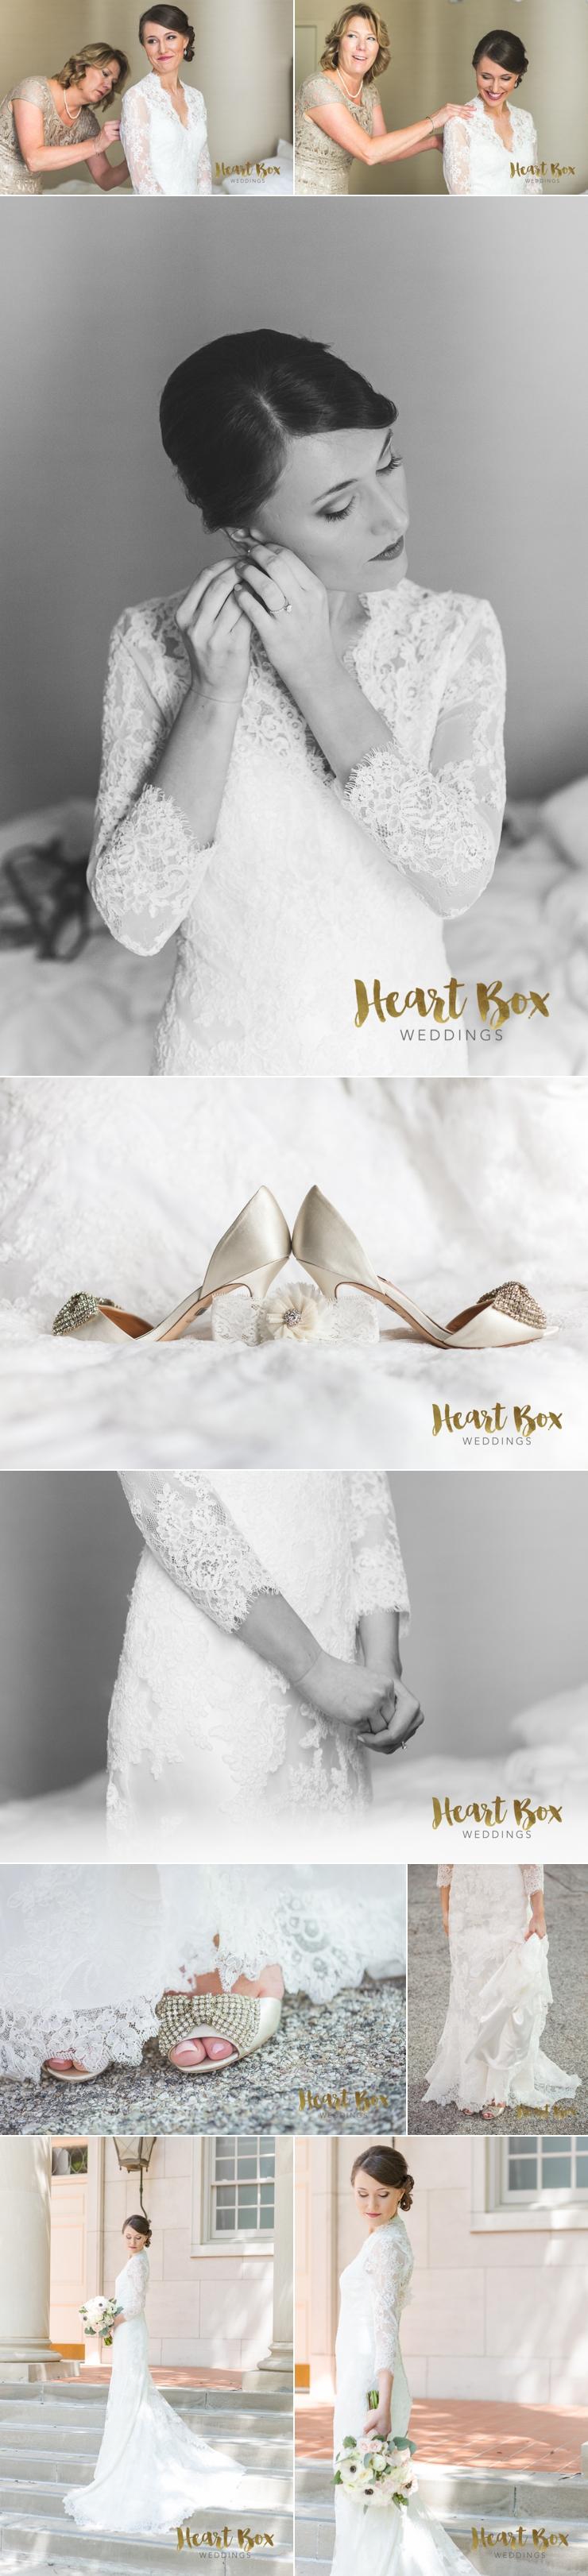 Fegan Wedding Blog Collages 3.jpg